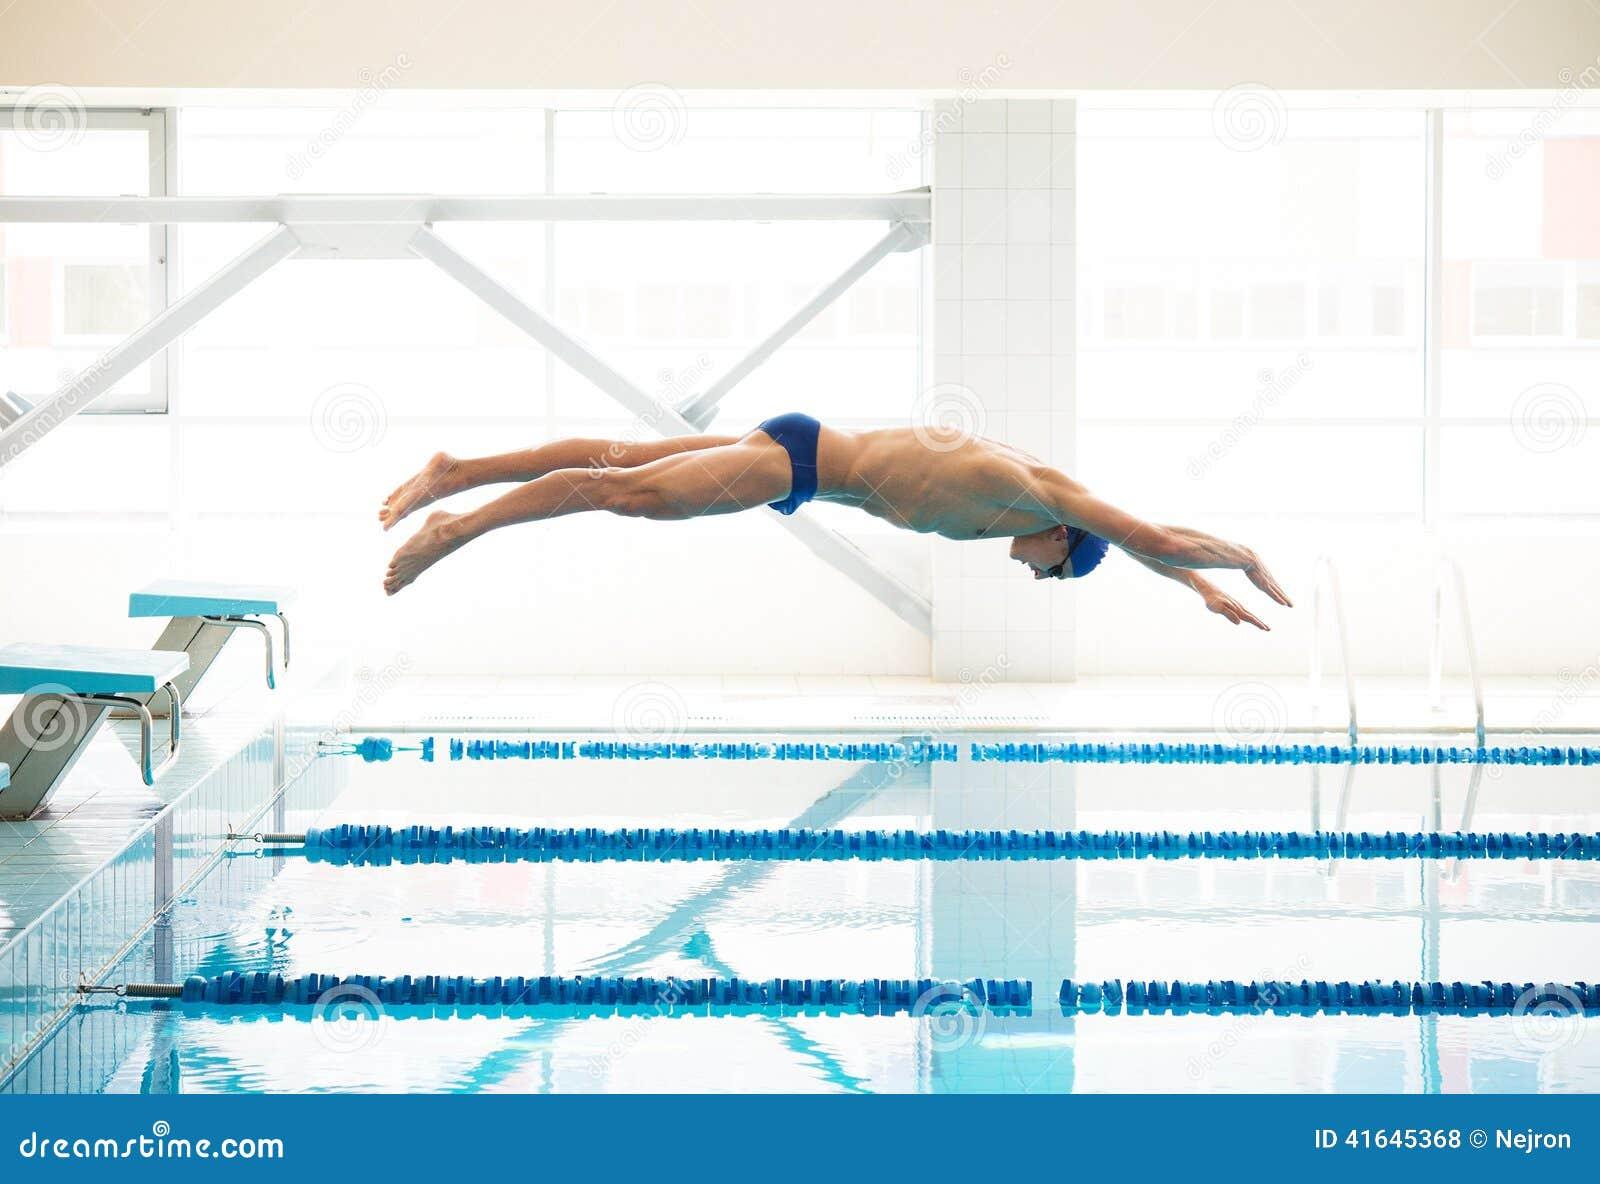 Swimmer jumping from starting block stock photo image 41645368 - Olympic swimming starting blocks ...